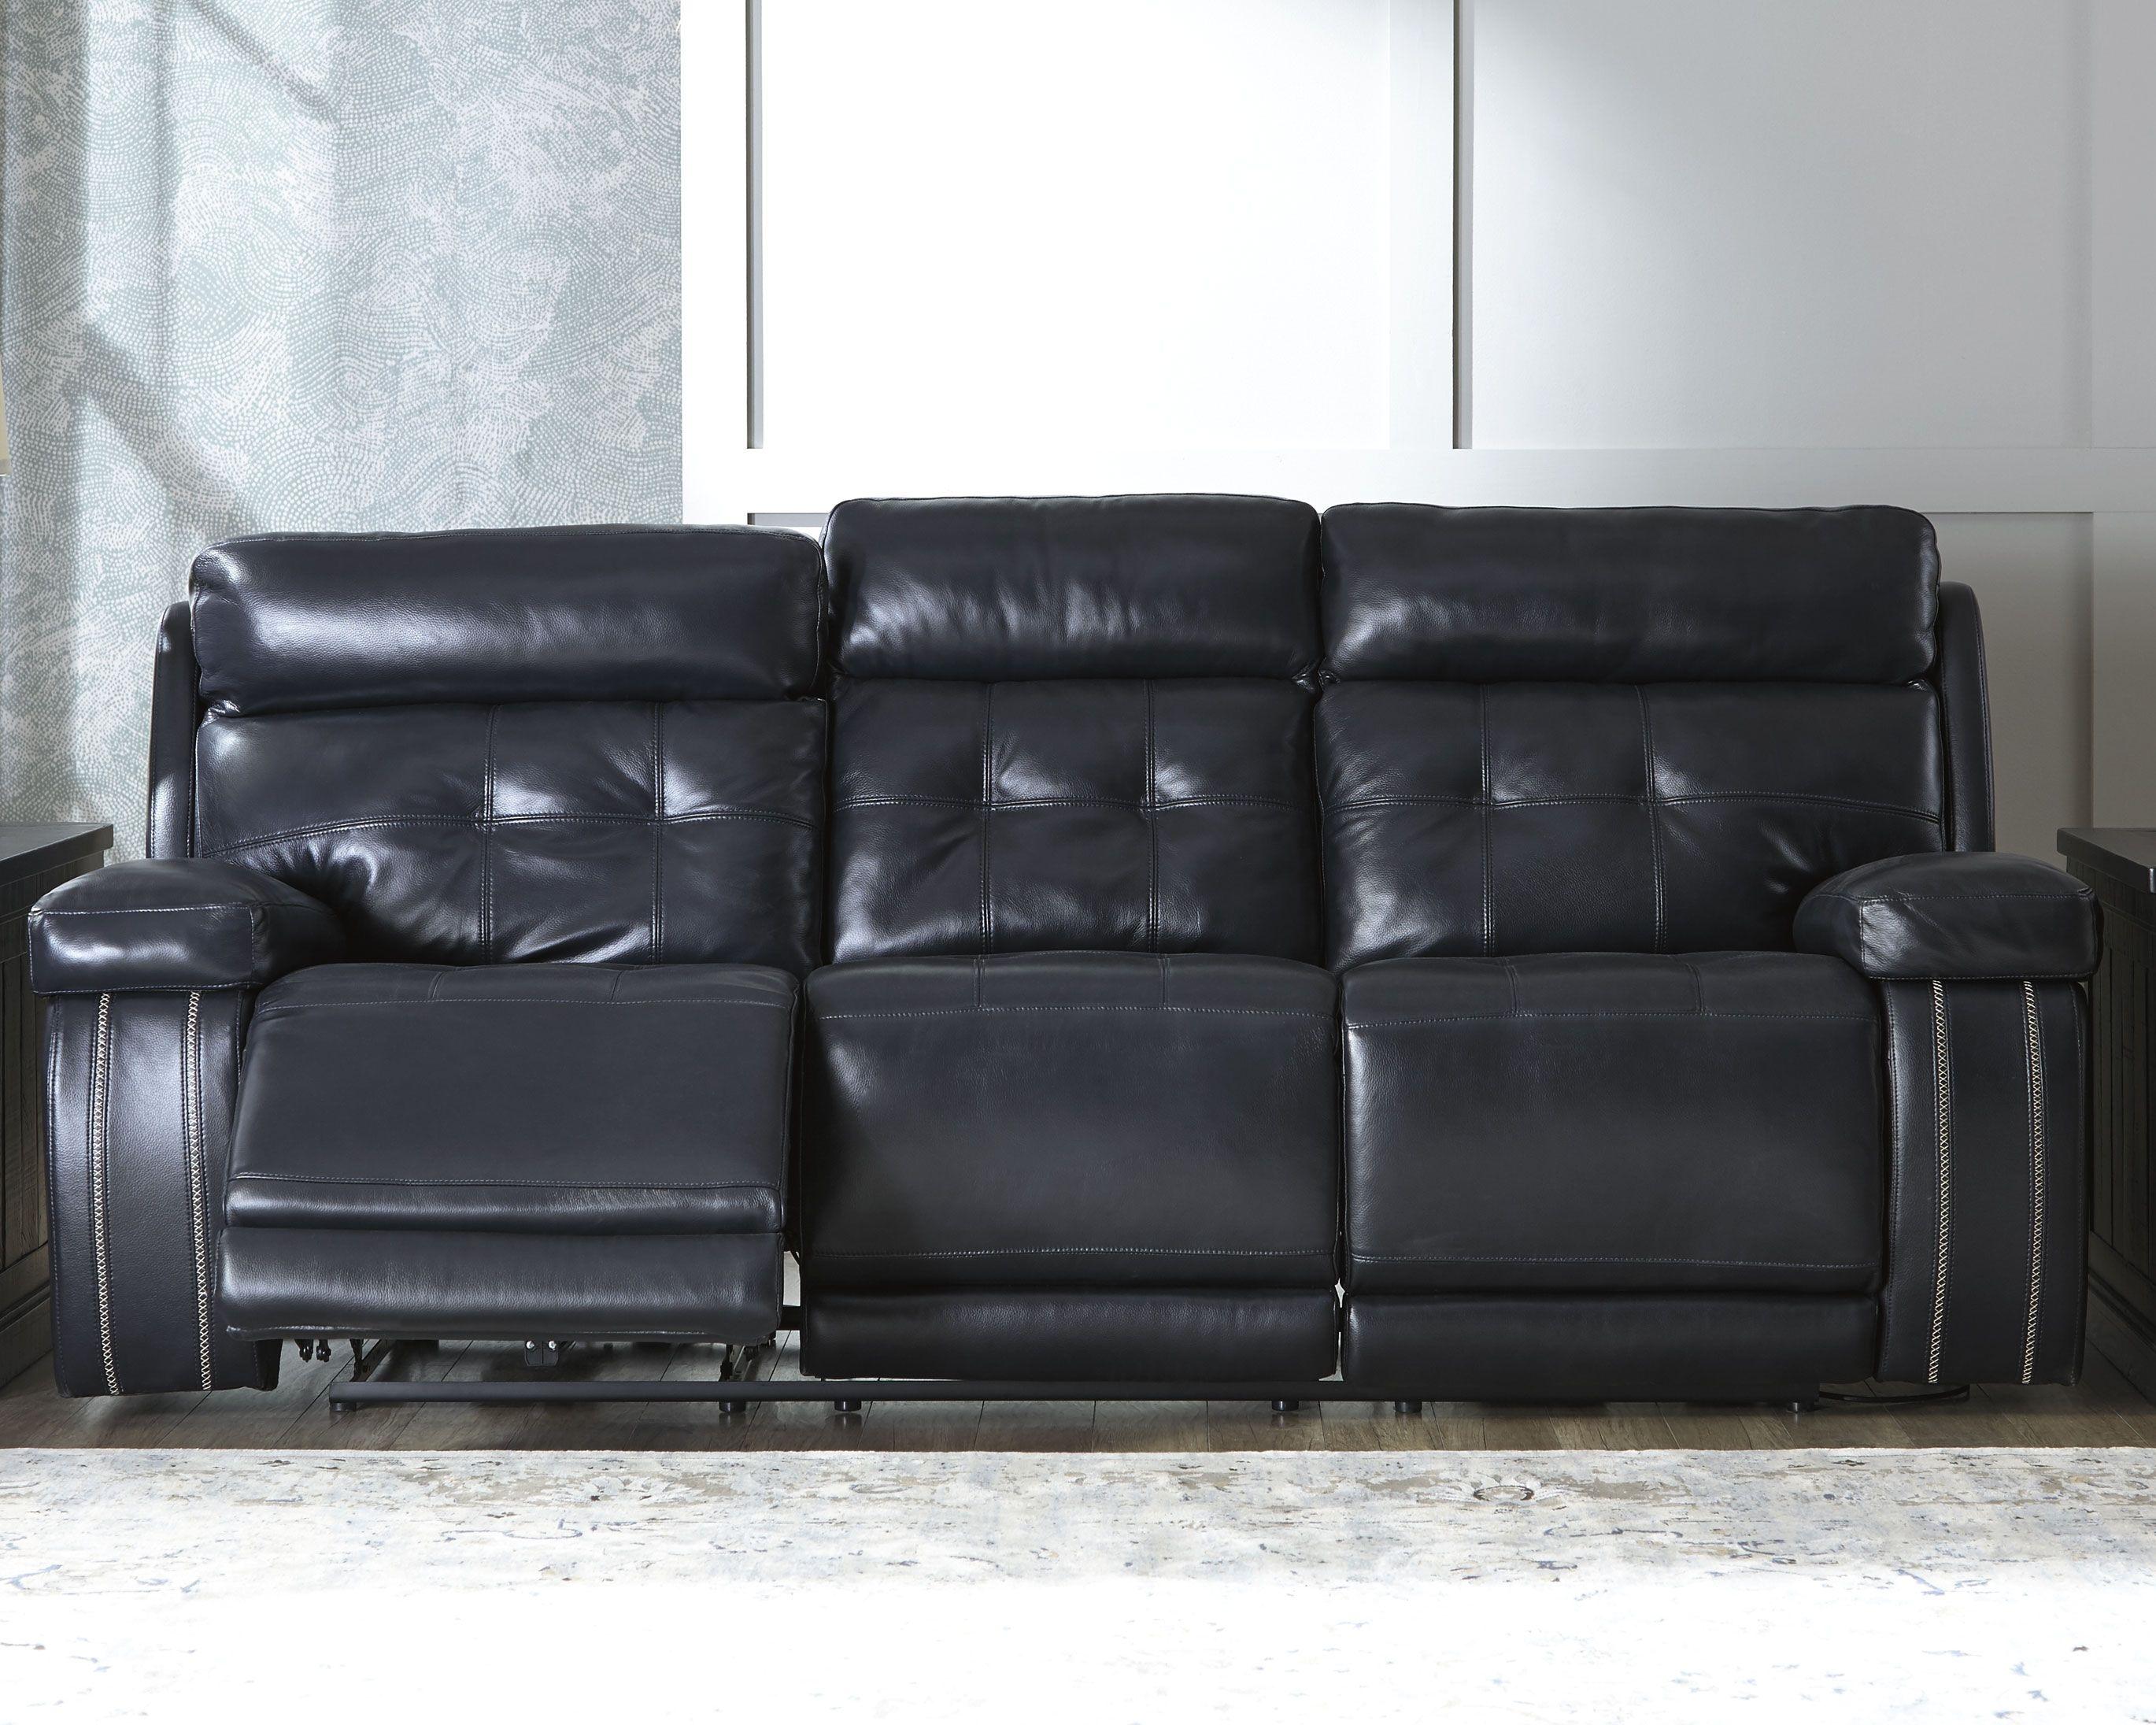 Brilliant Graford Power Reclining Sofa In 2019 Products Reclining Ibusinesslaw Wood Chair Design Ideas Ibusinesslaworg